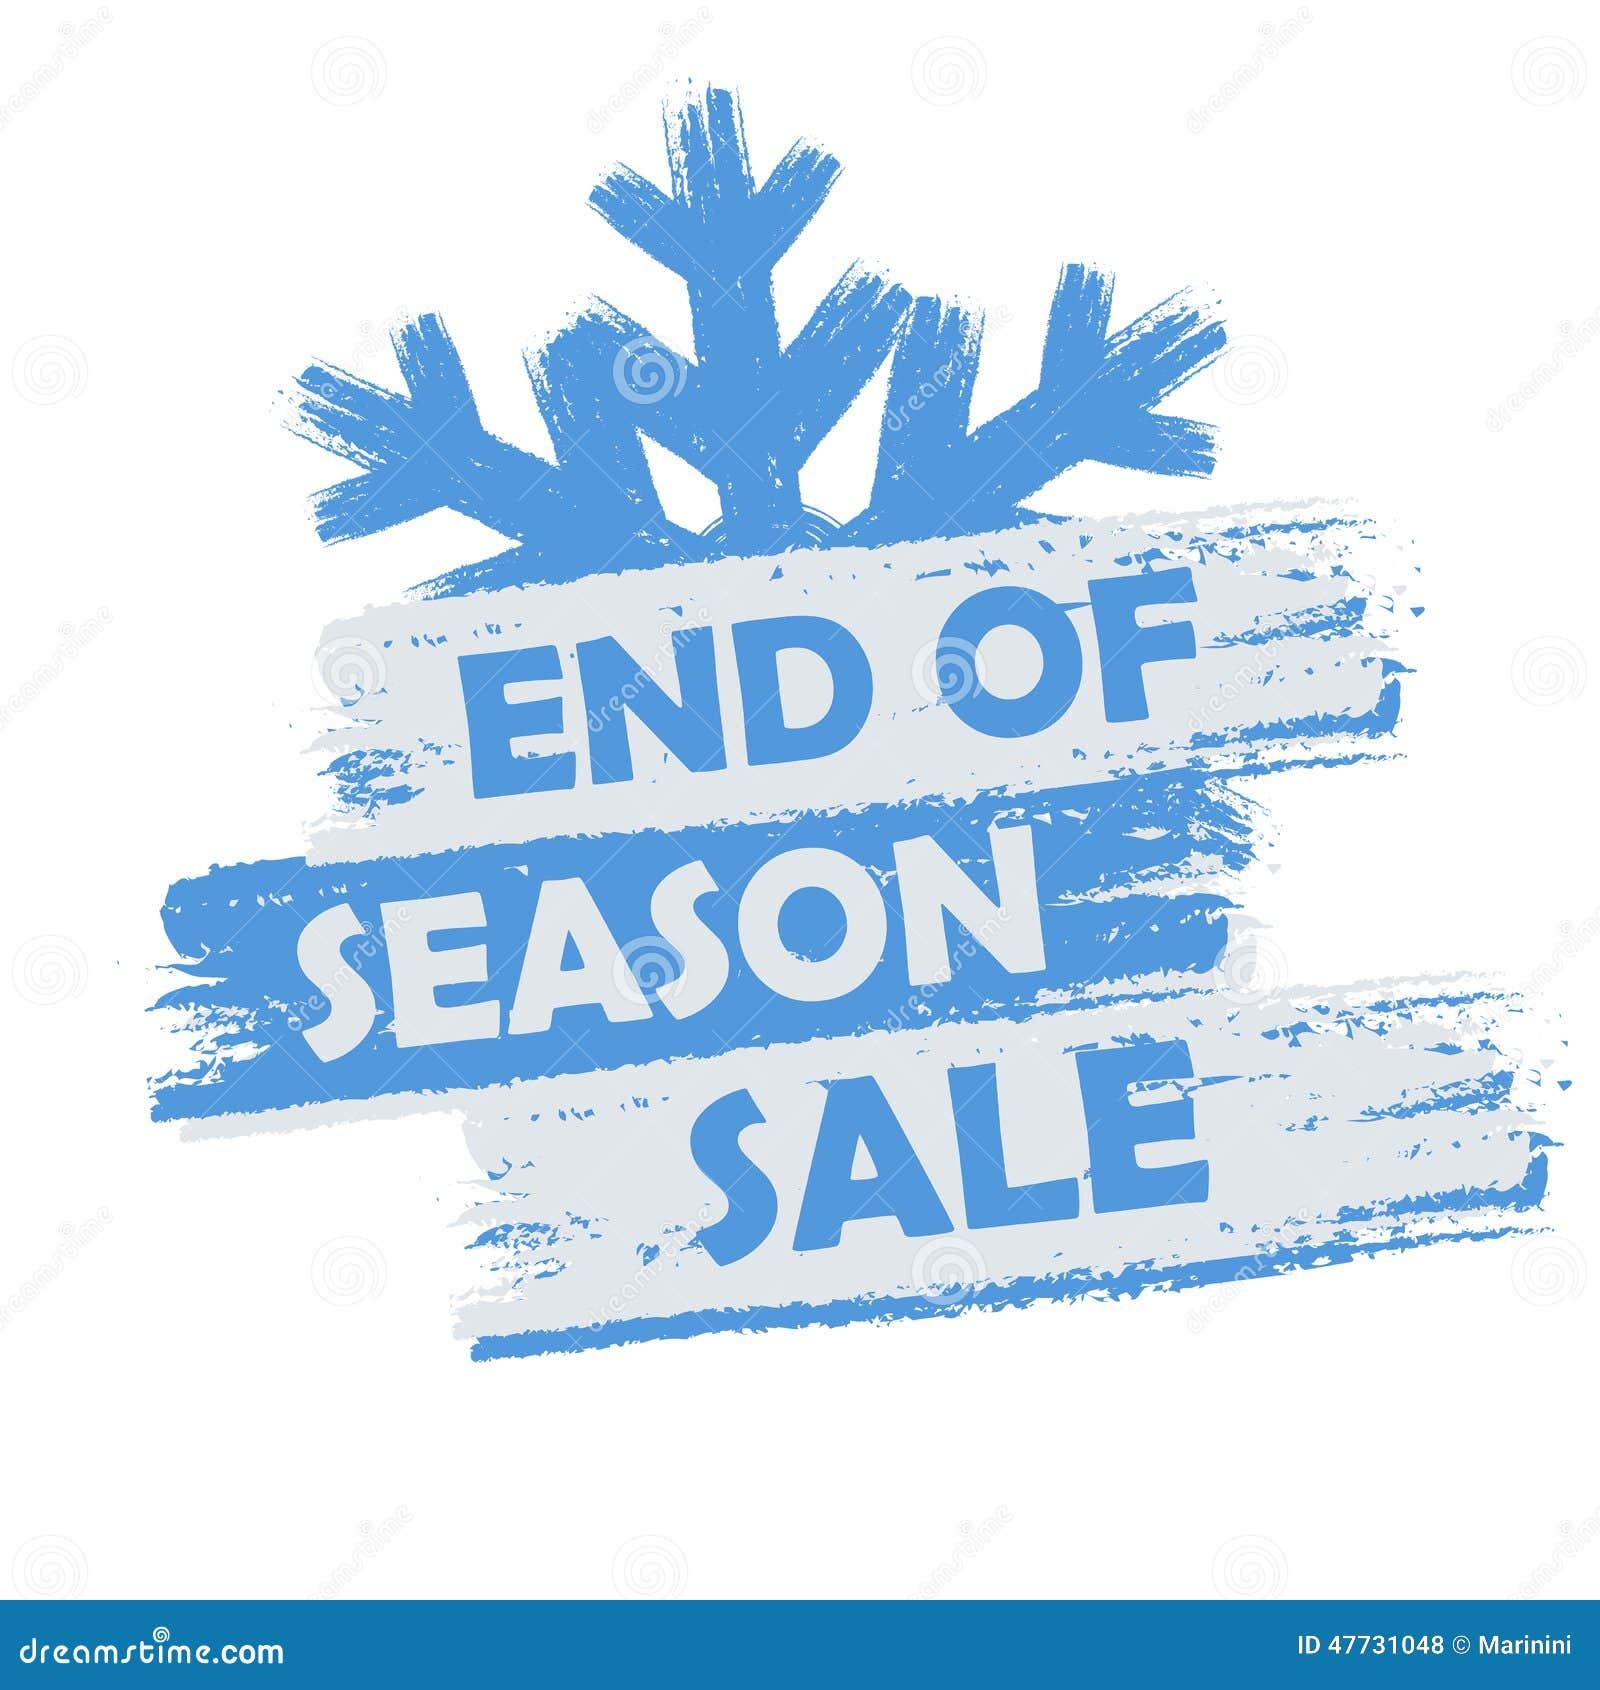 7e2db6f7b79 End of season sale stock illustration. Illustration of liquidation ...